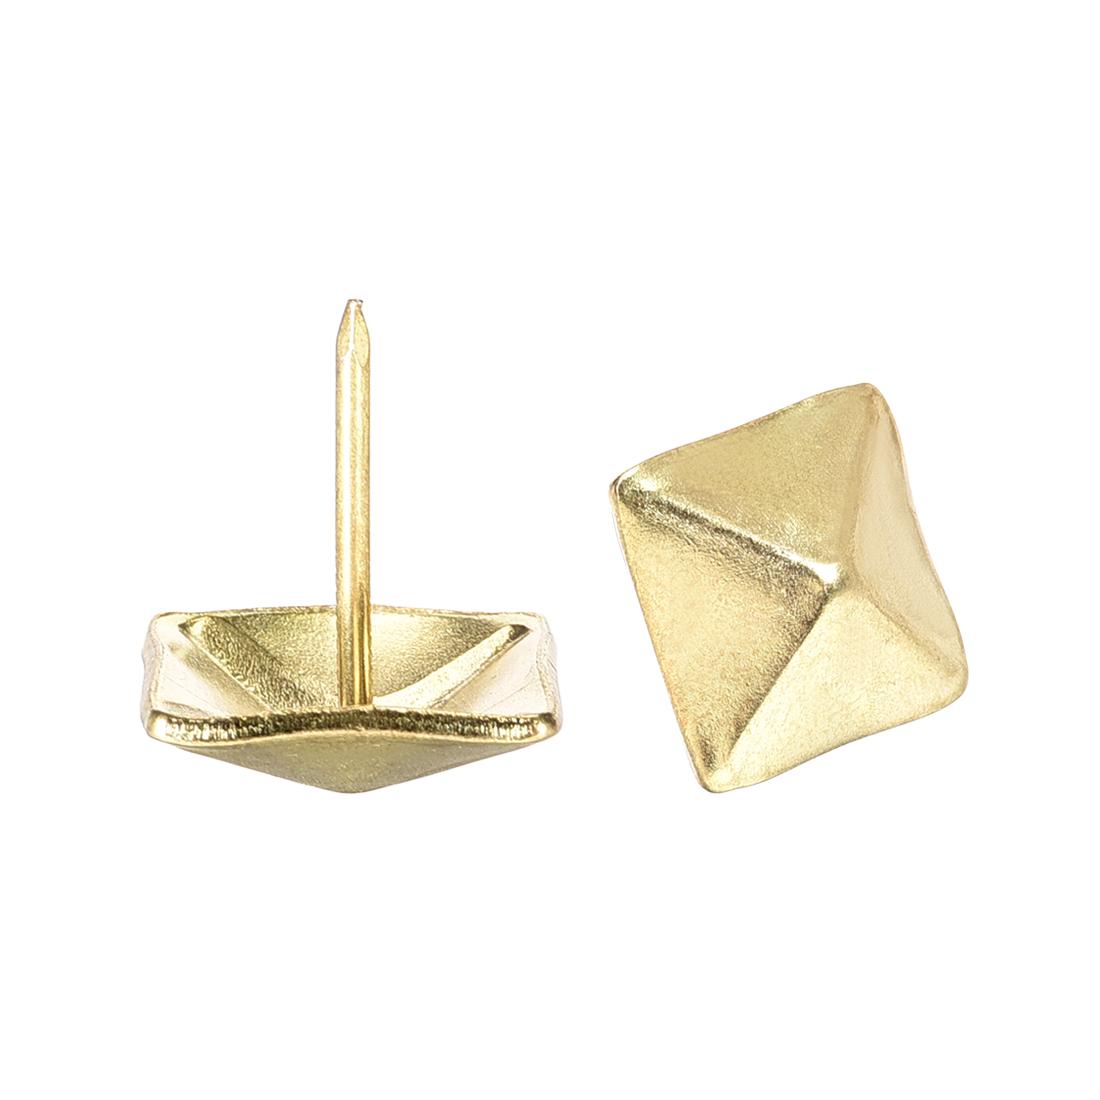 Upholstery Nails Tacks 19mm Square Head 21mm Height Nails Pins Gold Tone 10 Pcs